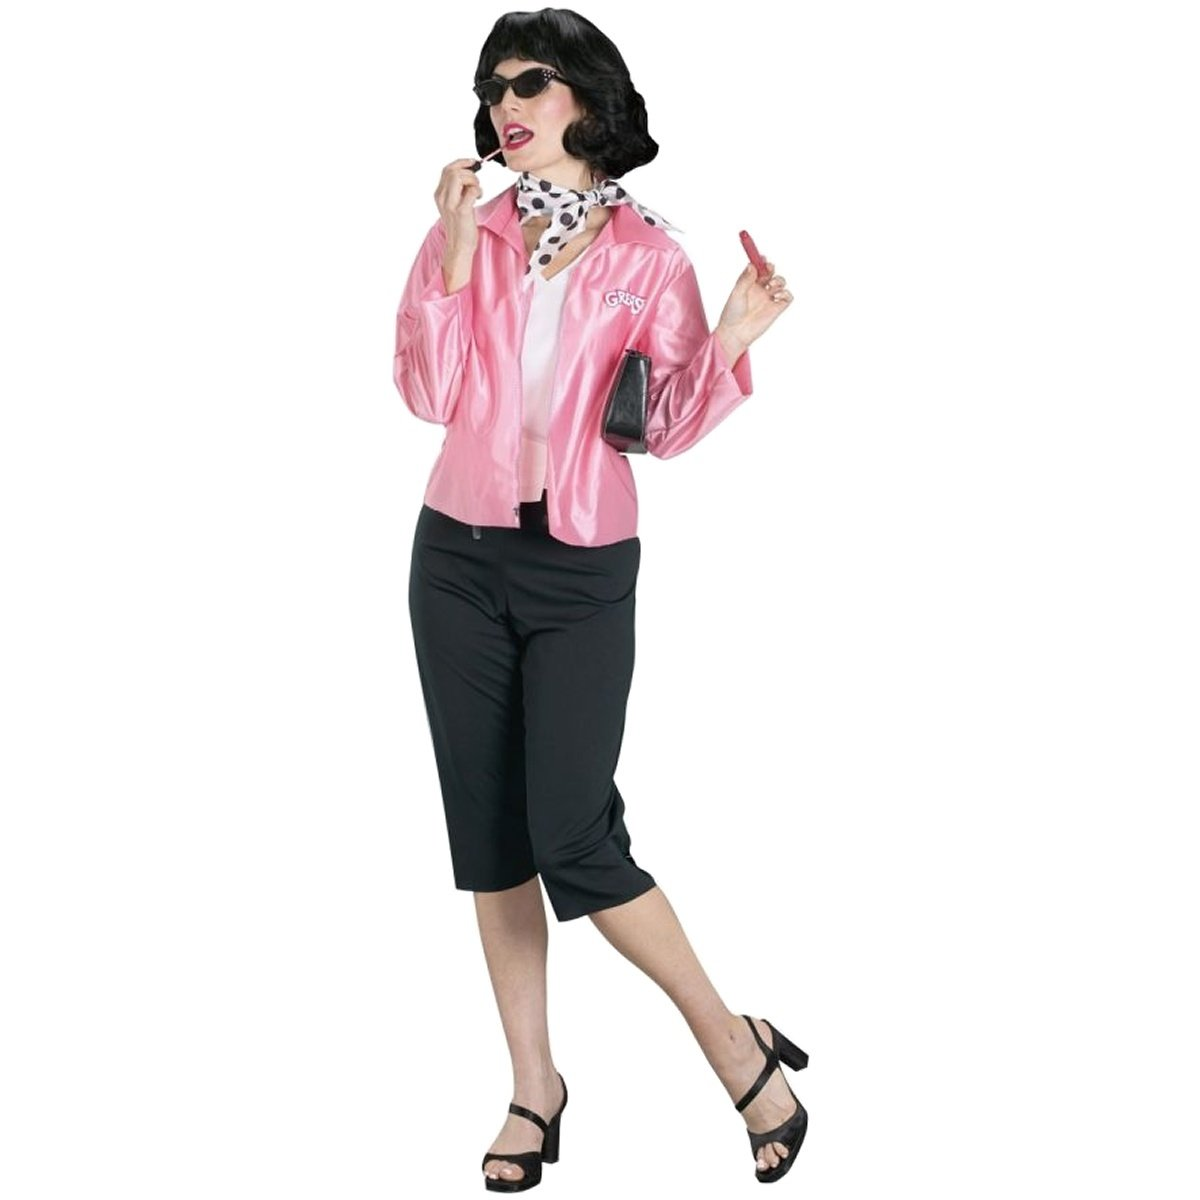 Amazon.com GREASE PINK LADY Clothing